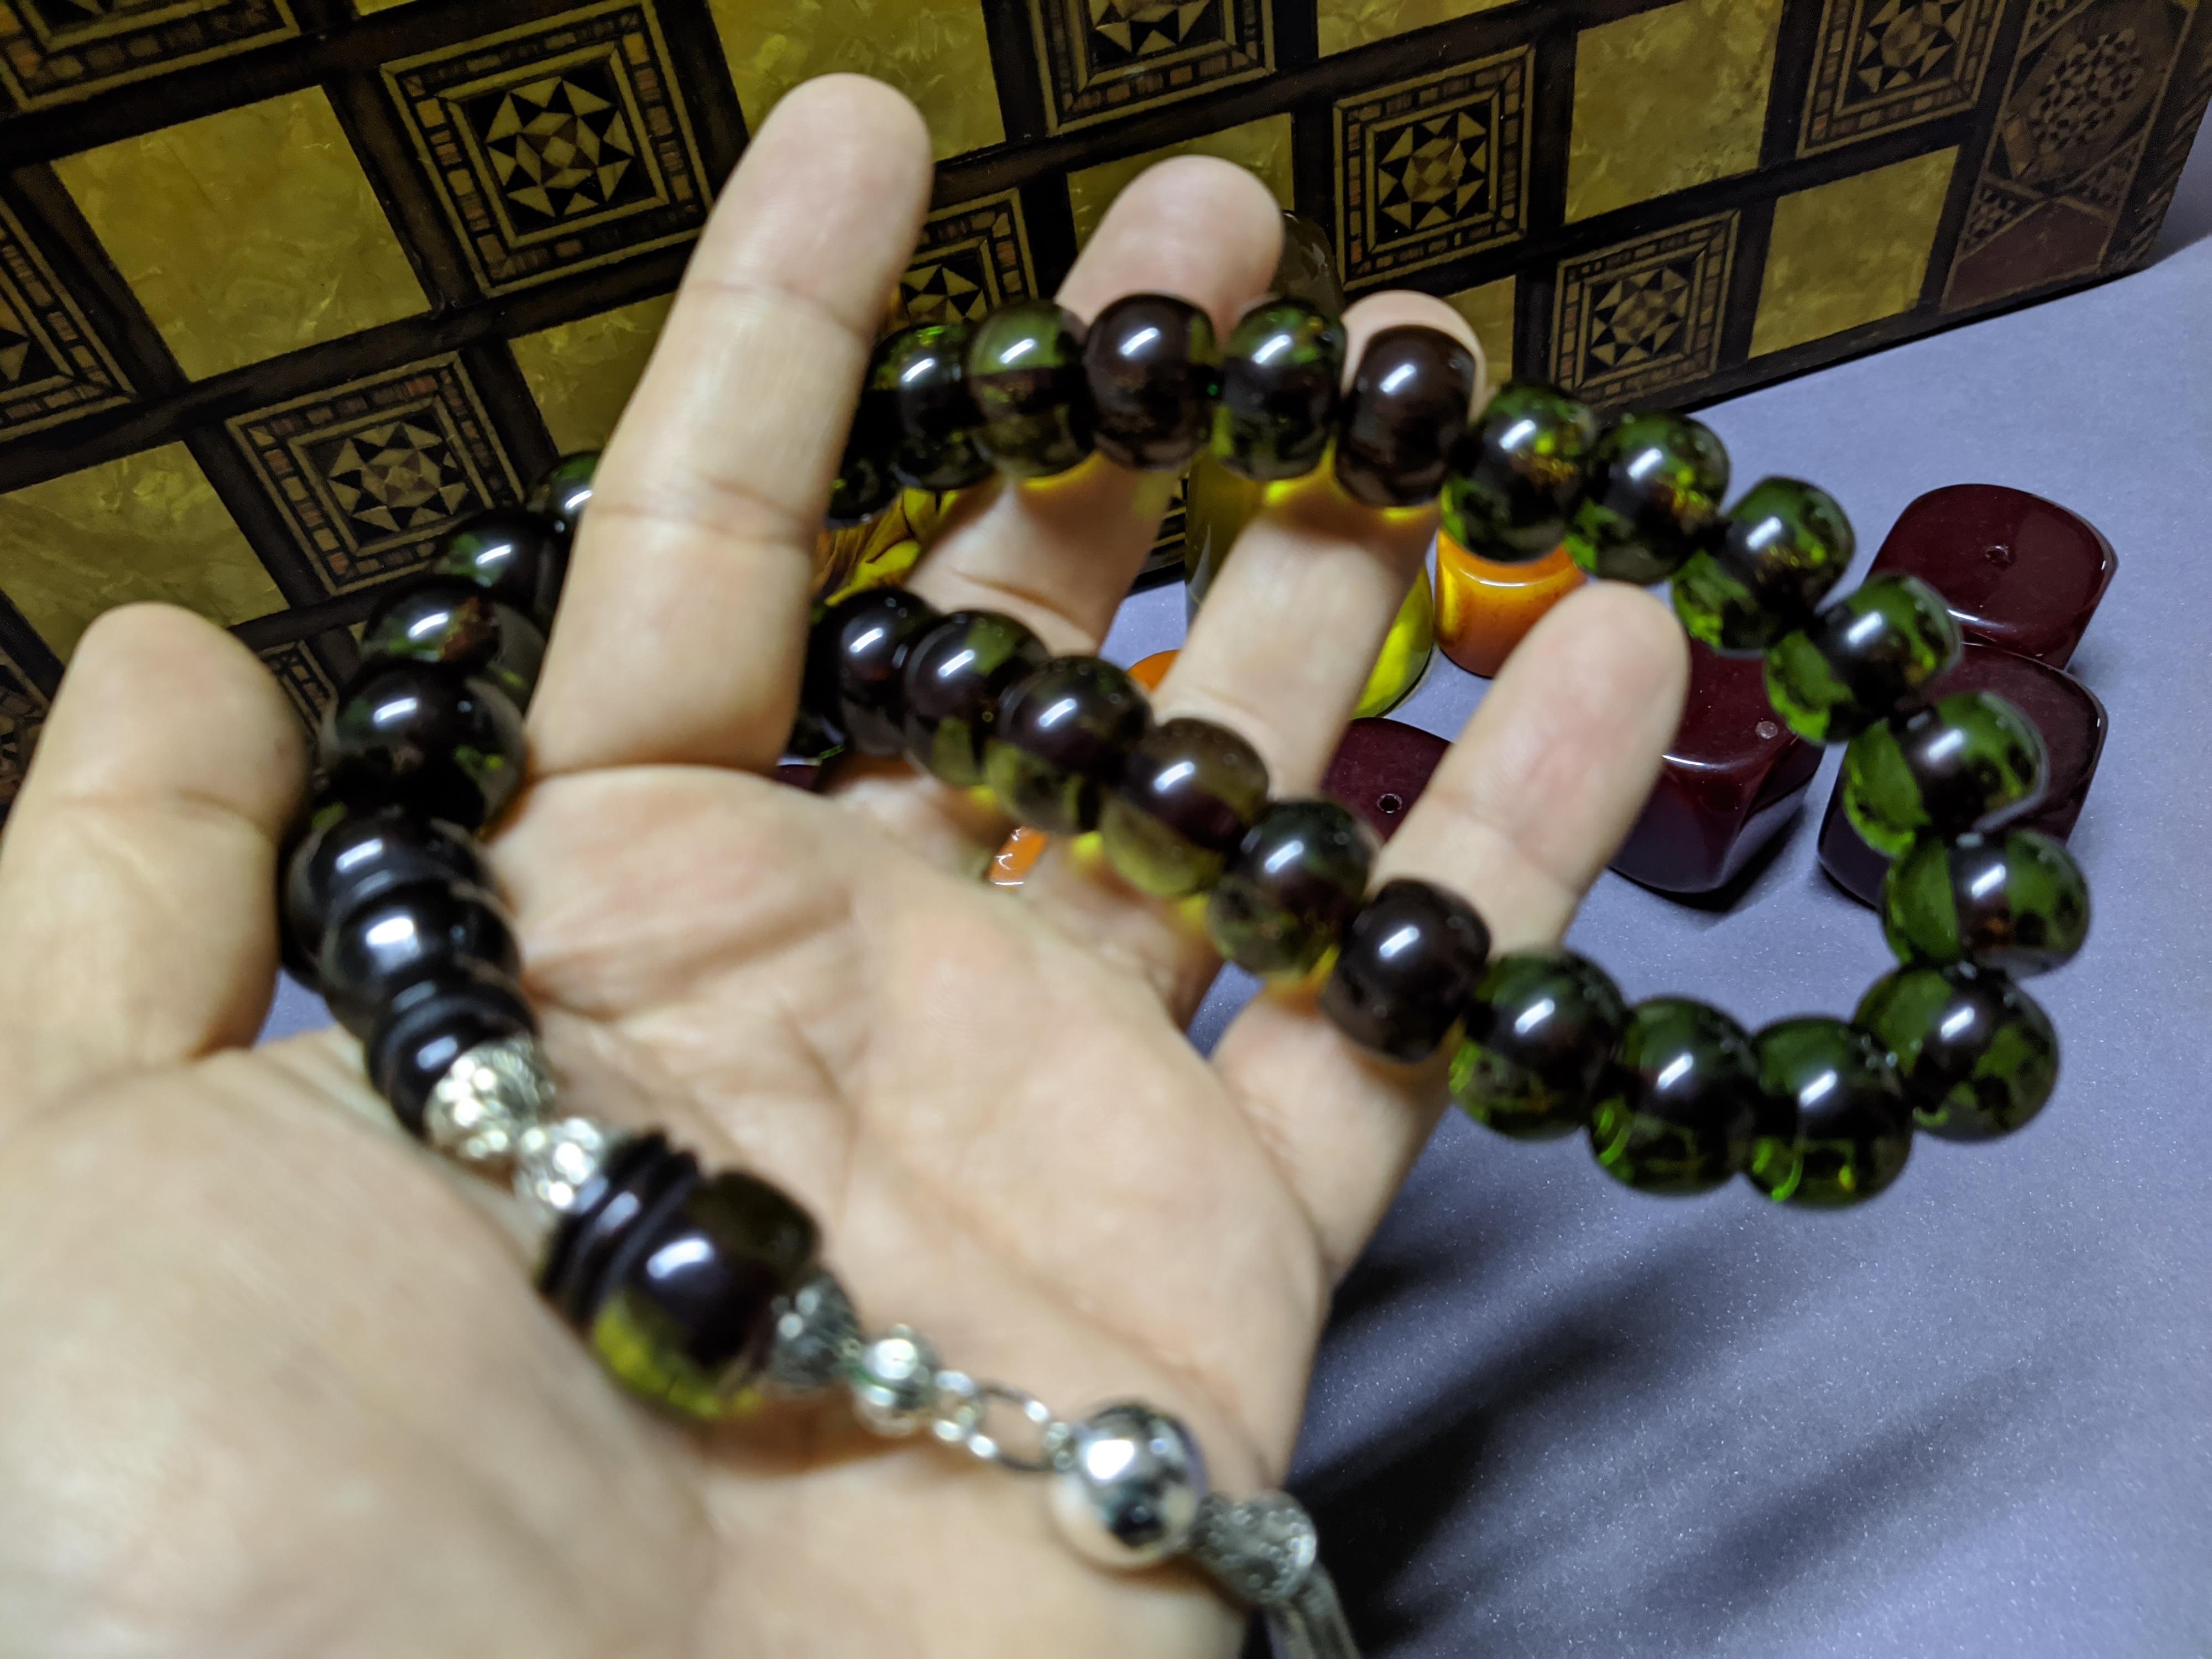 Ottoman Faturan German Amber Sandalous Misbaha Prayer Beads Islamic Gift Tasbih Tasbeeh Tasbeh Rosary Tasbih #33